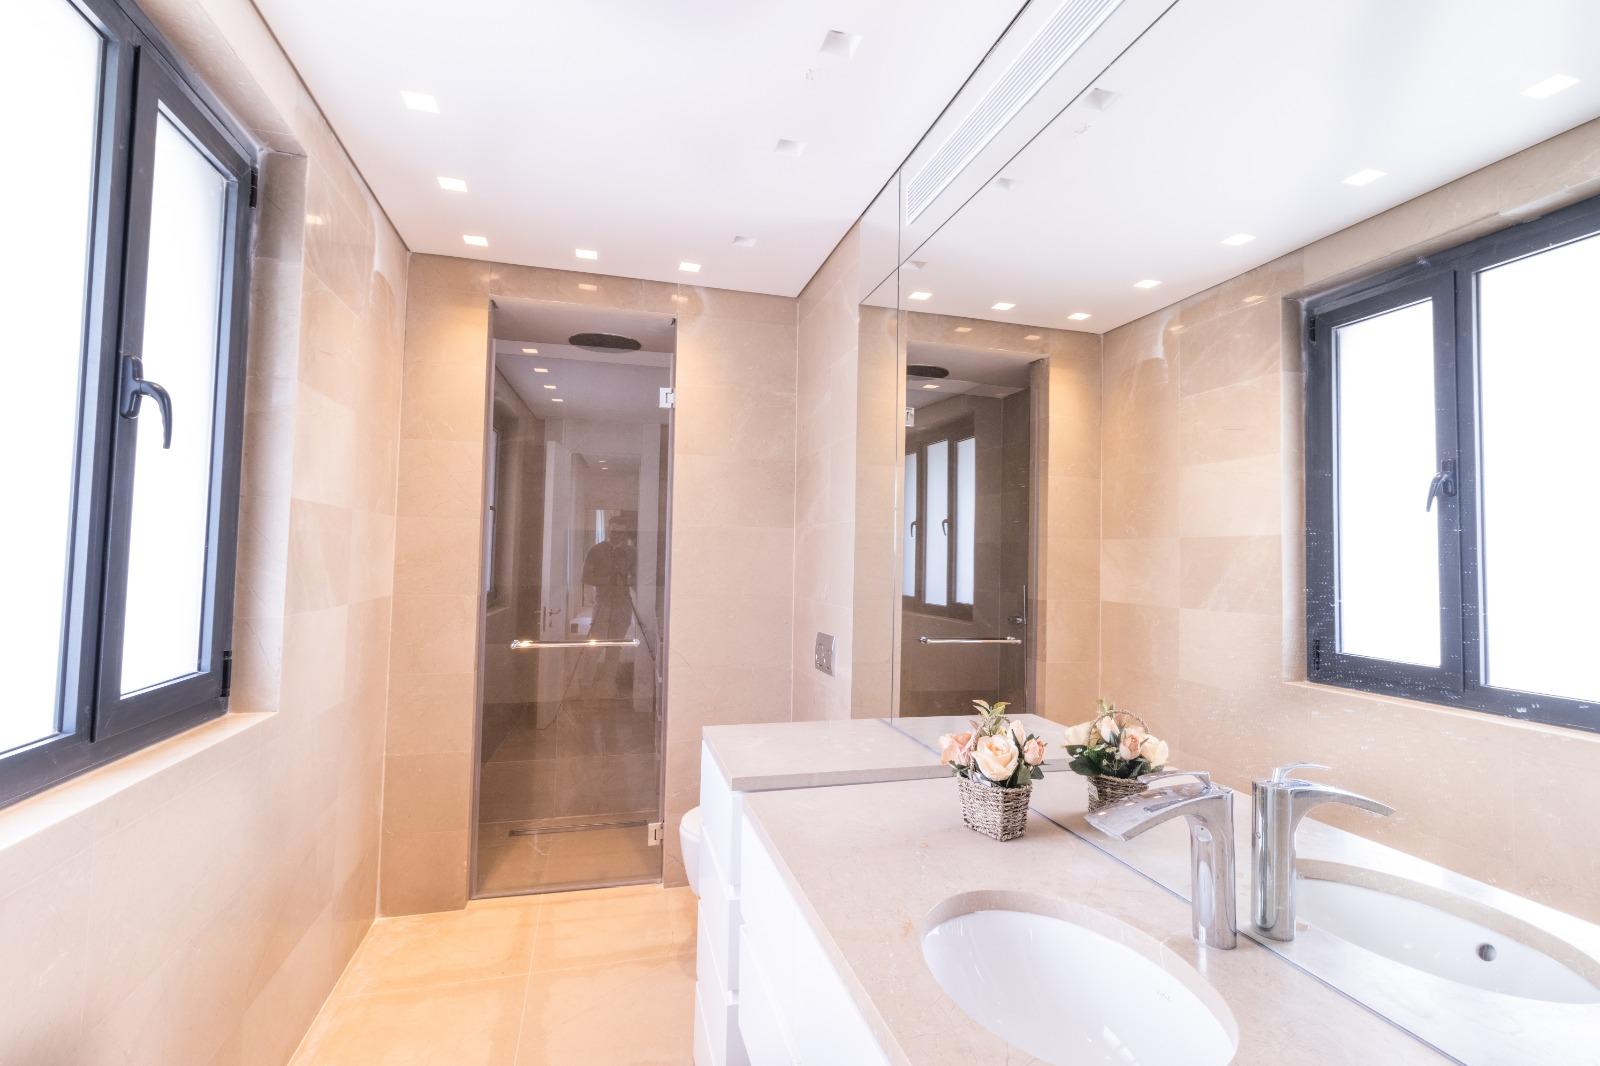 9.Luxury 6BR Mamilla  pool Penthouse  image #77